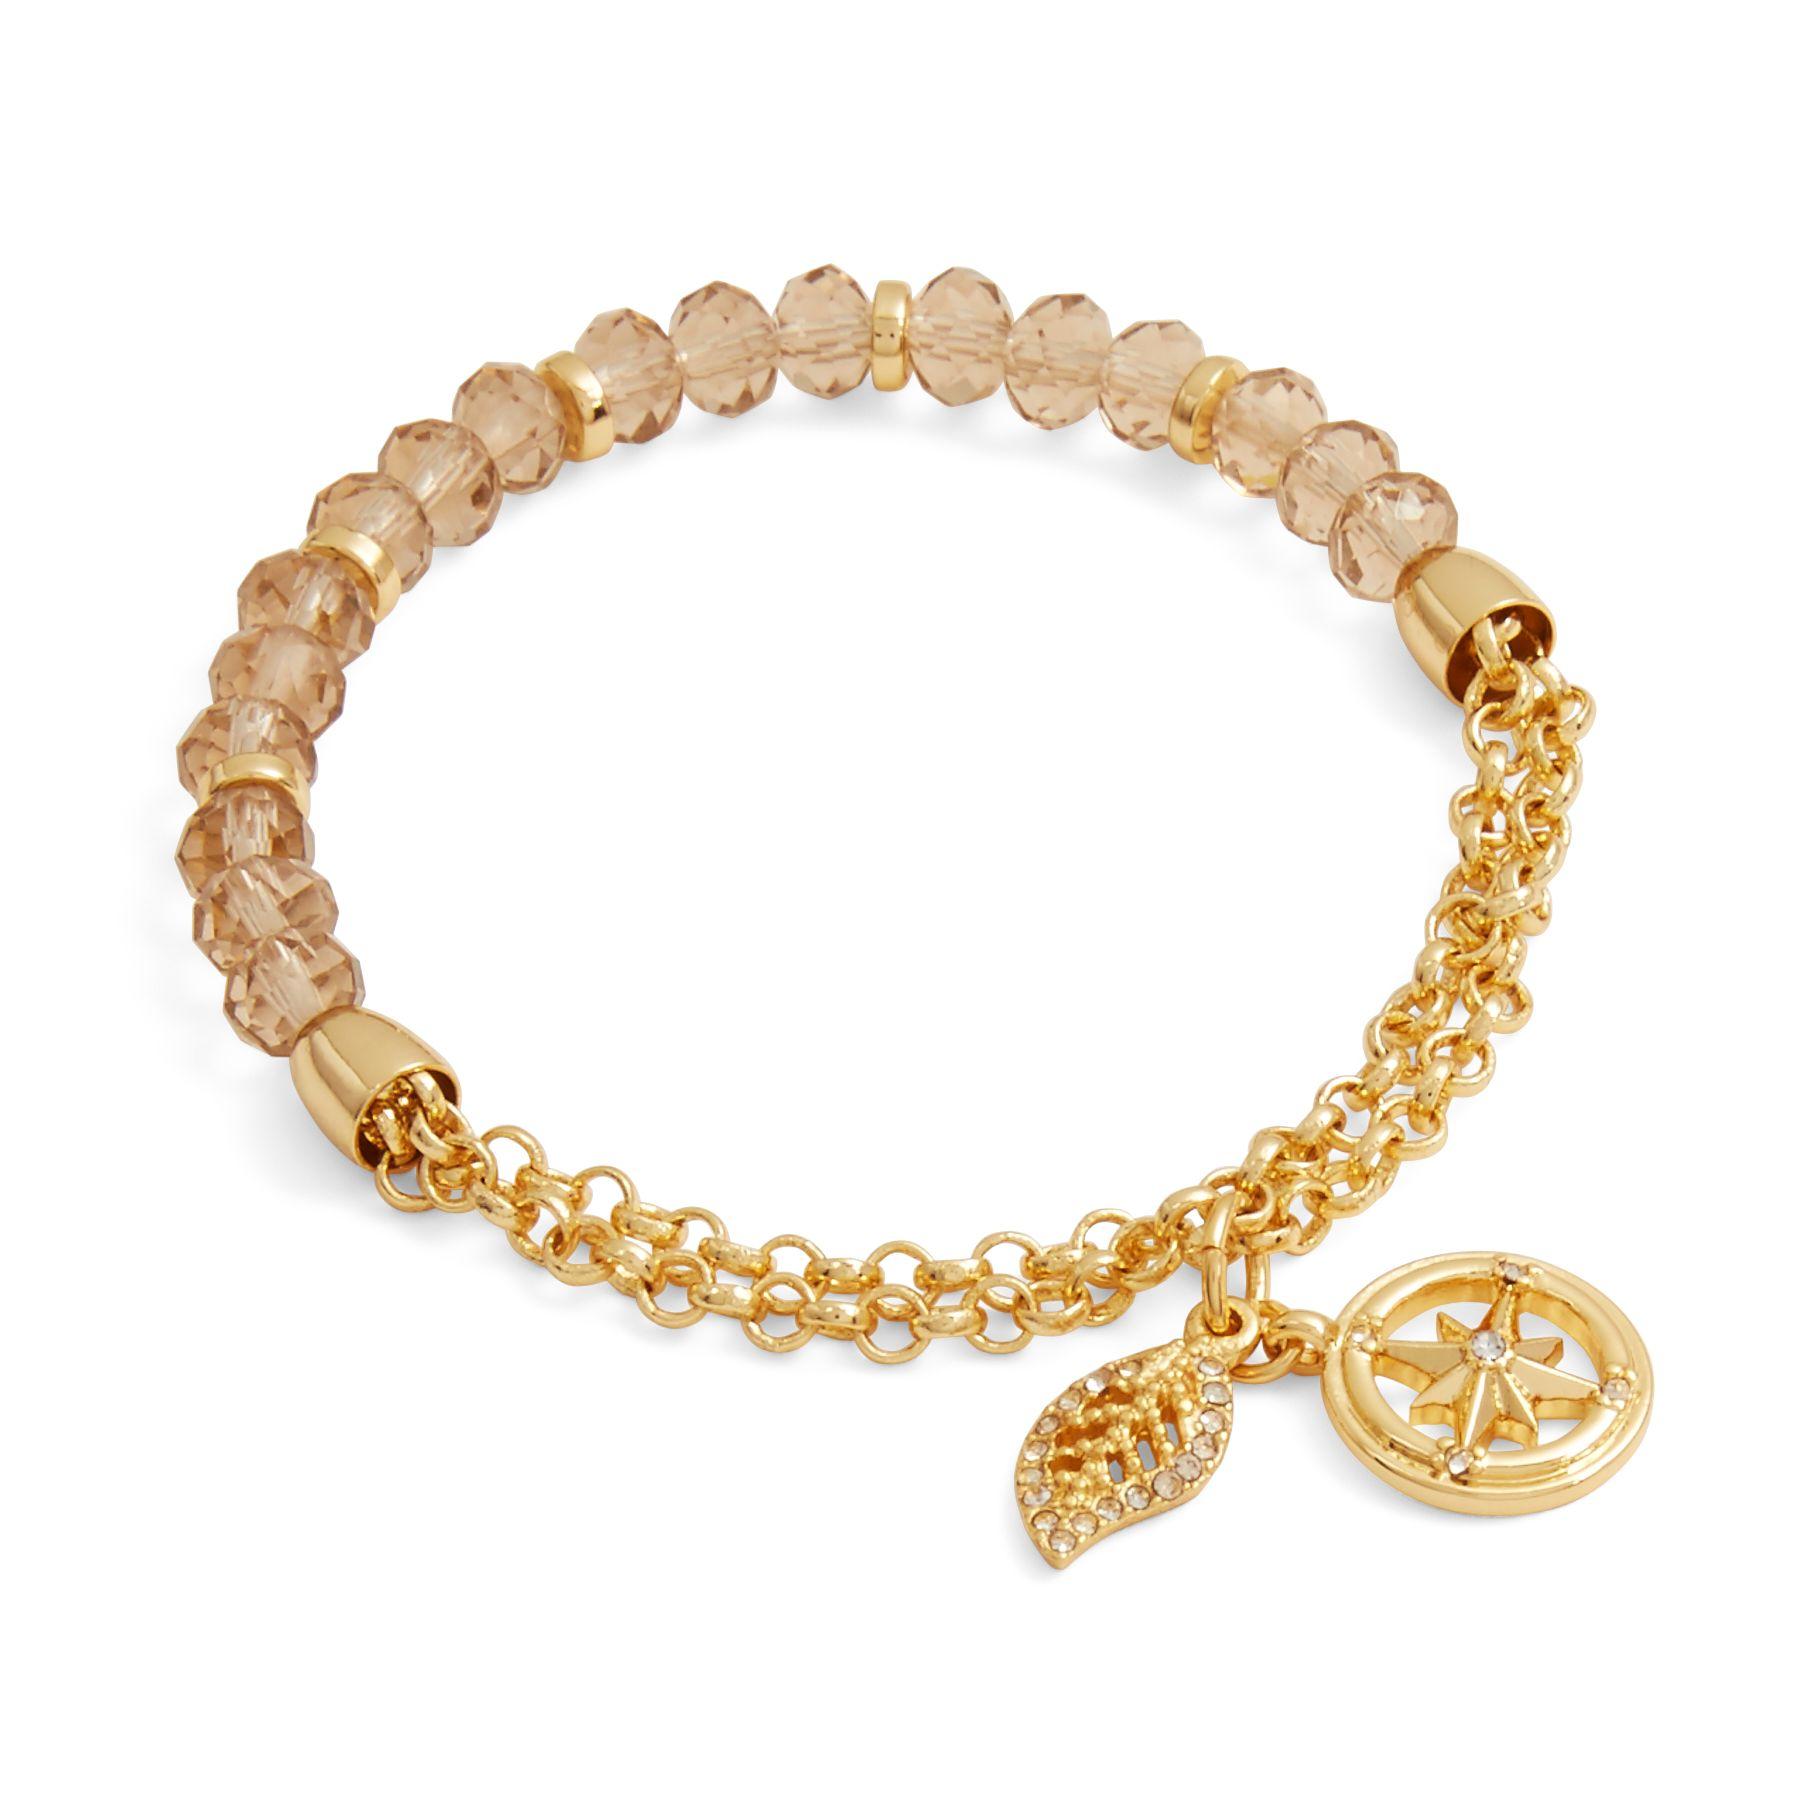 Bracelet $0 00